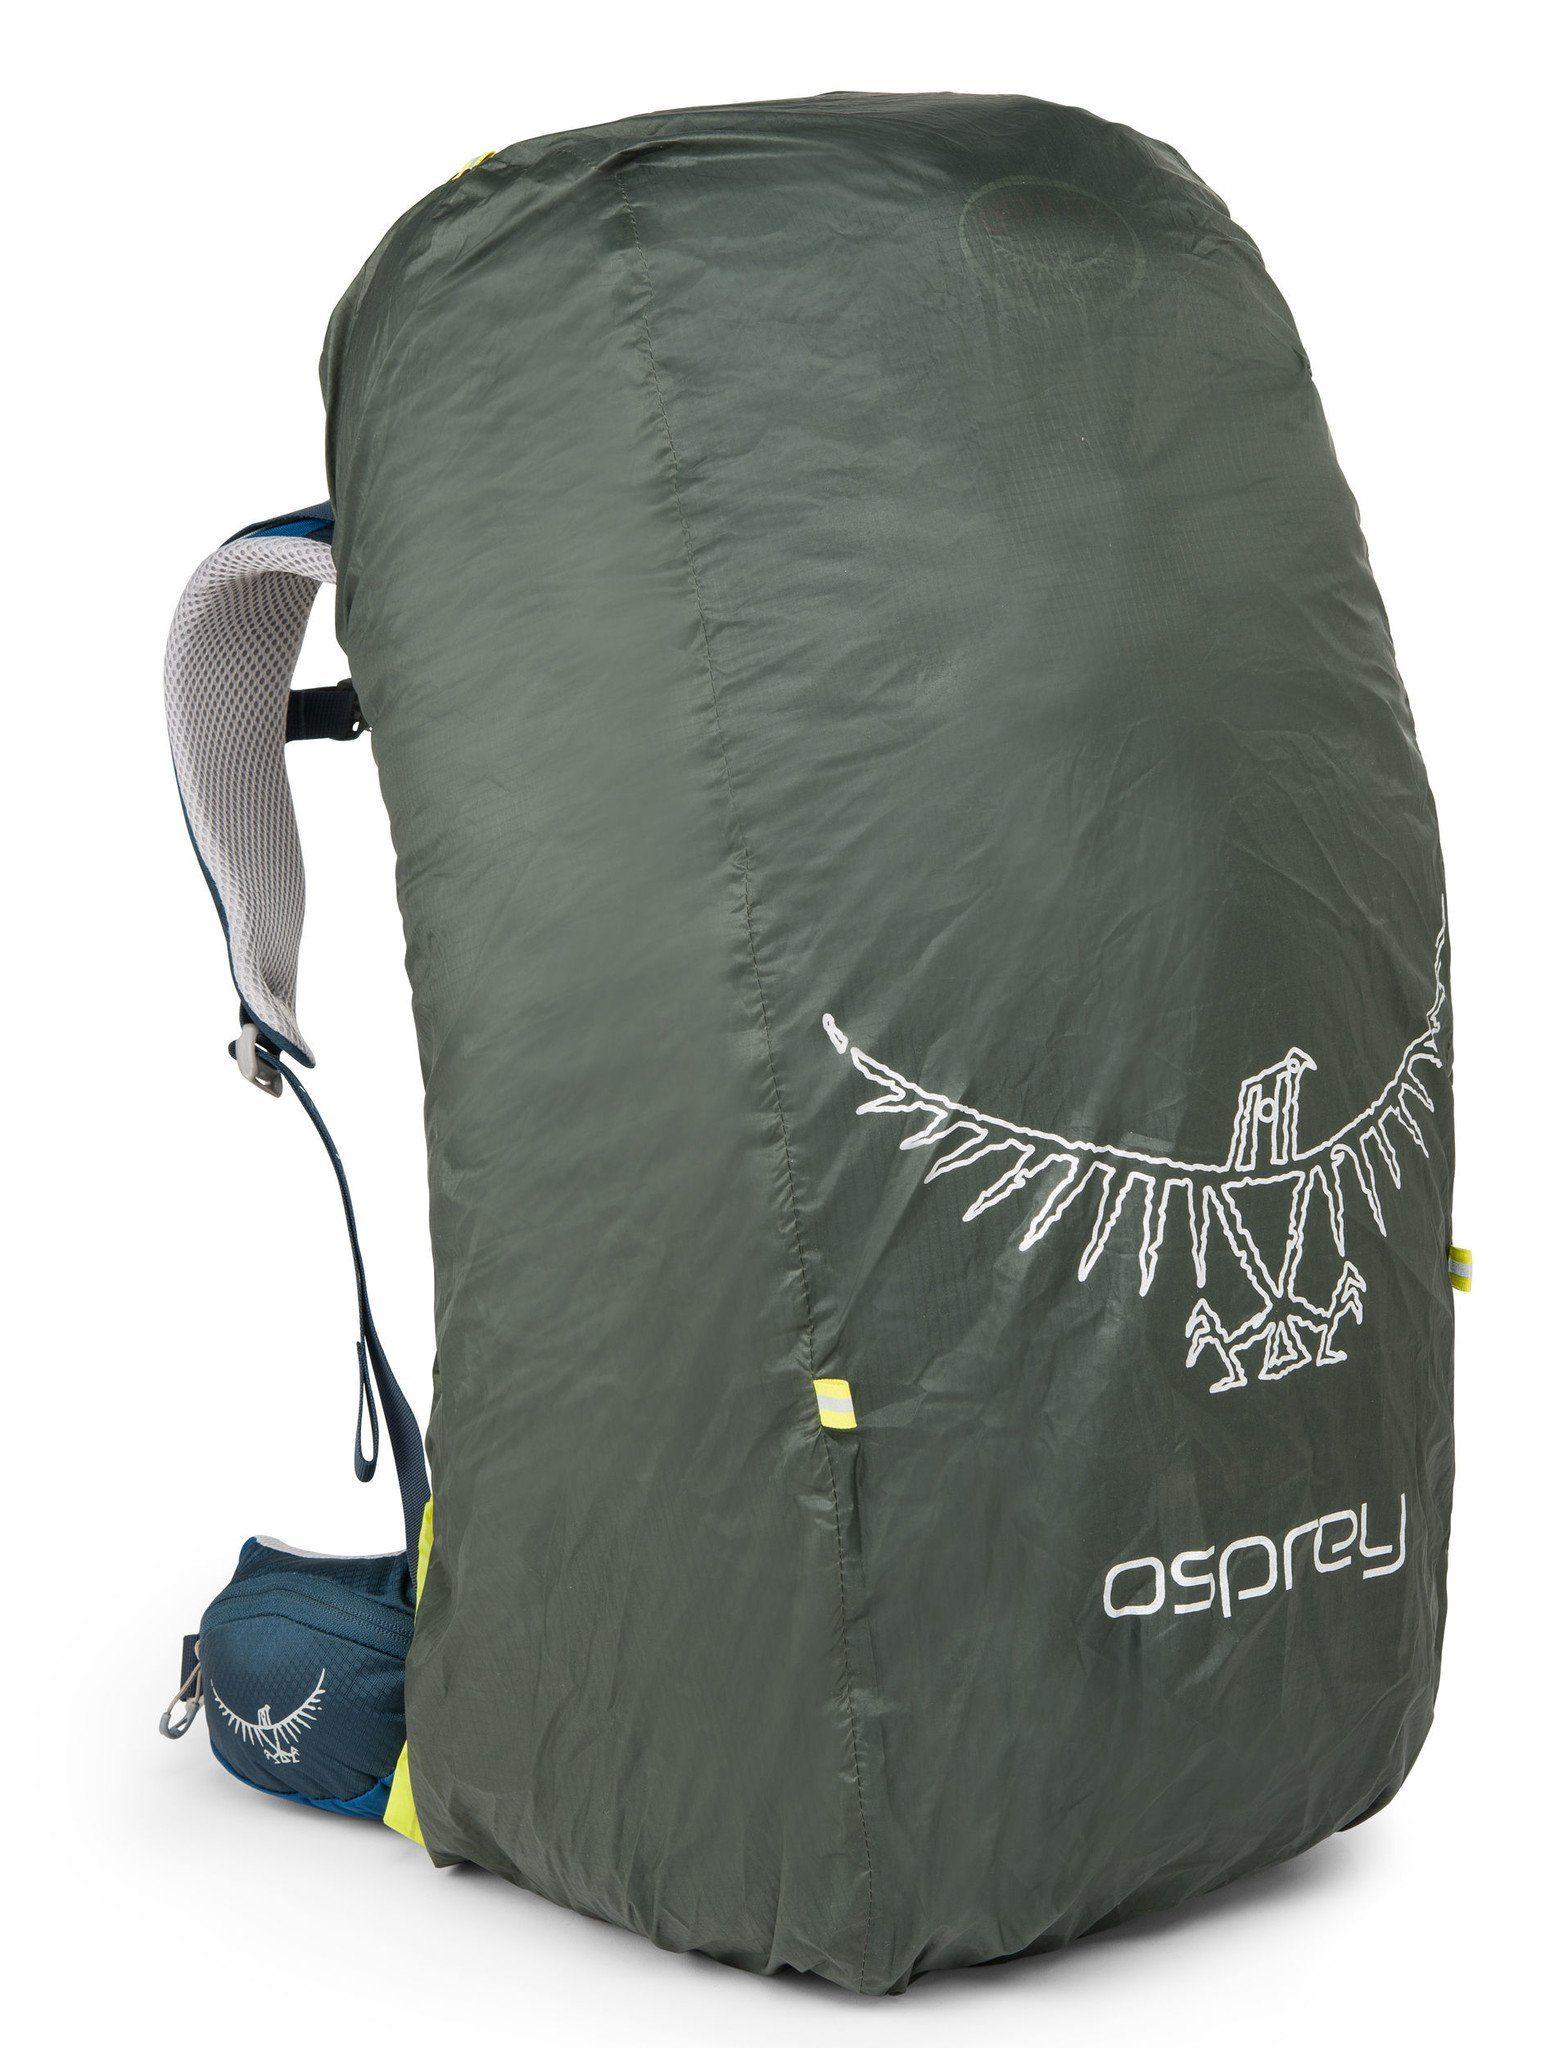 Osprey Wanderrucksack »Ultralight Raincover L«